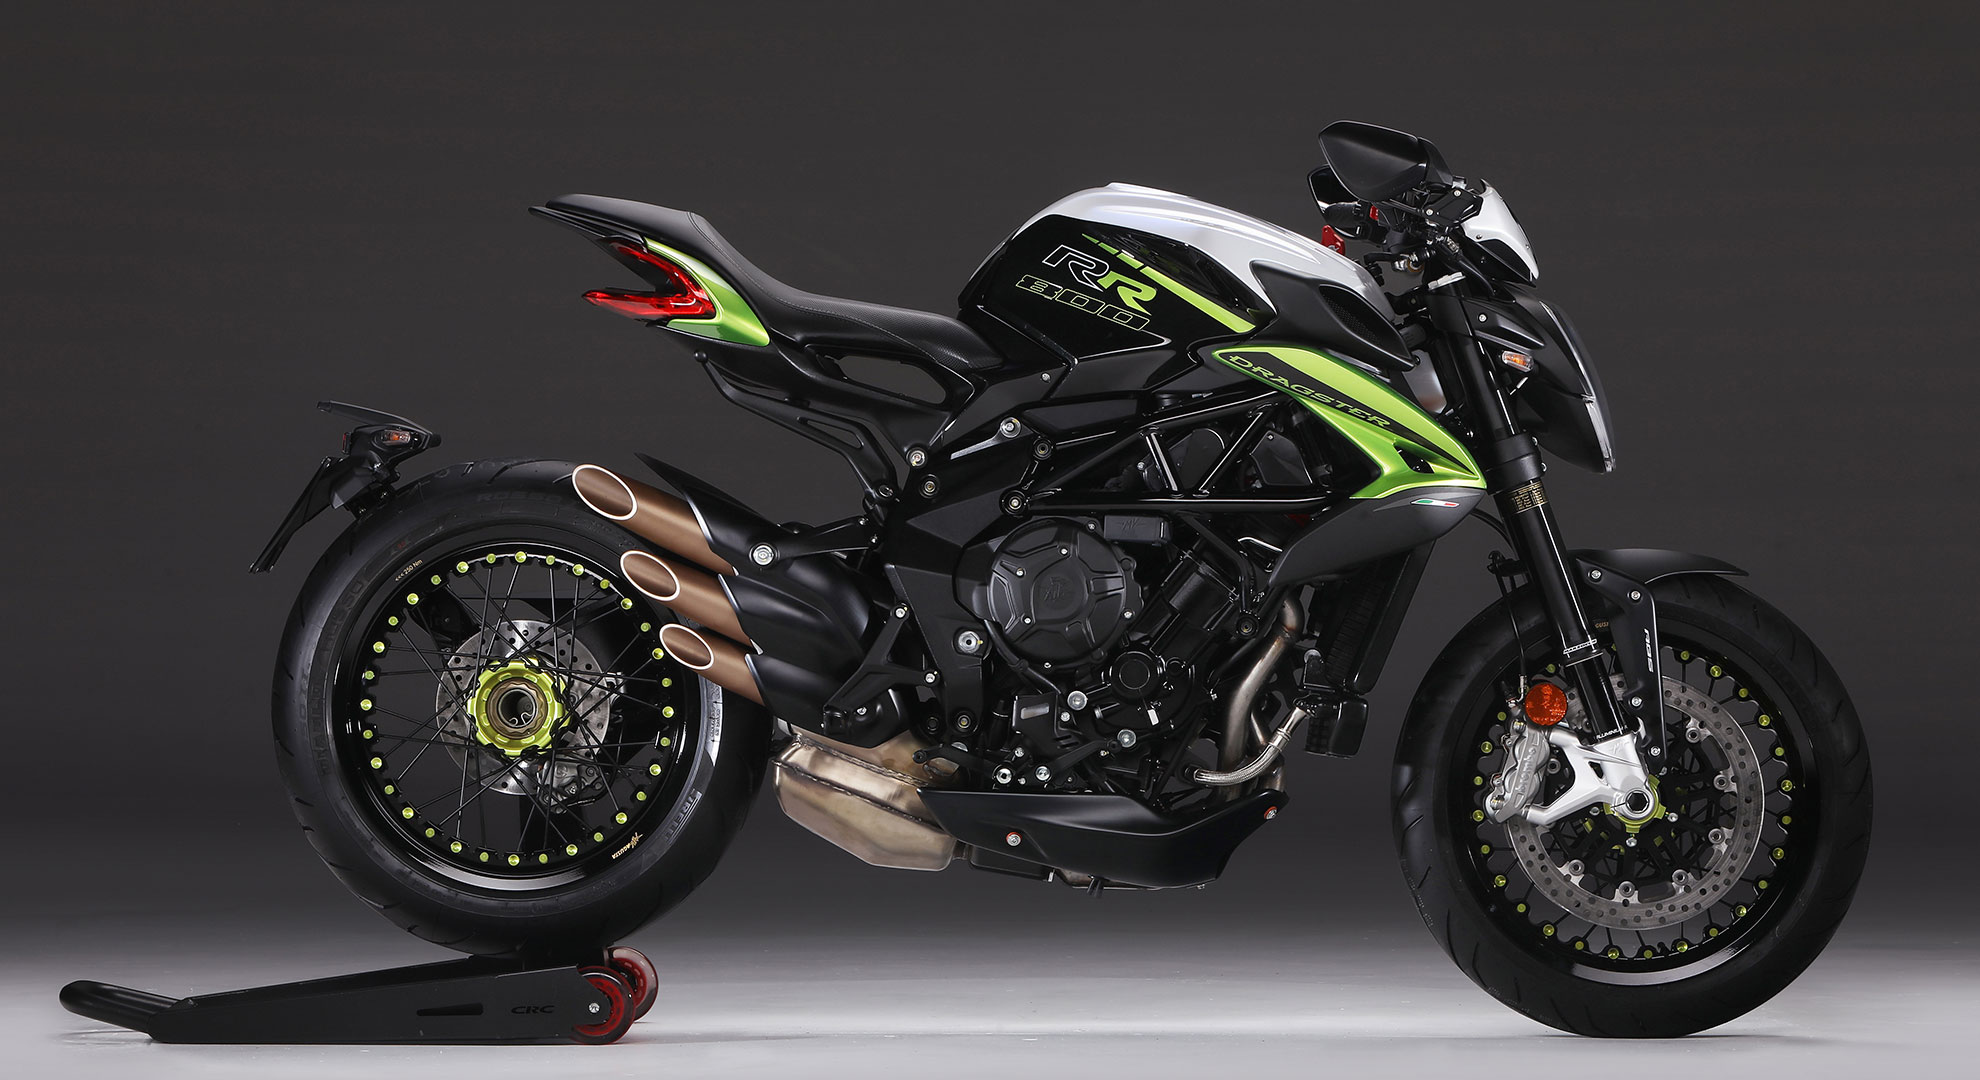 mv-agusta-dragster-800-rr-scs